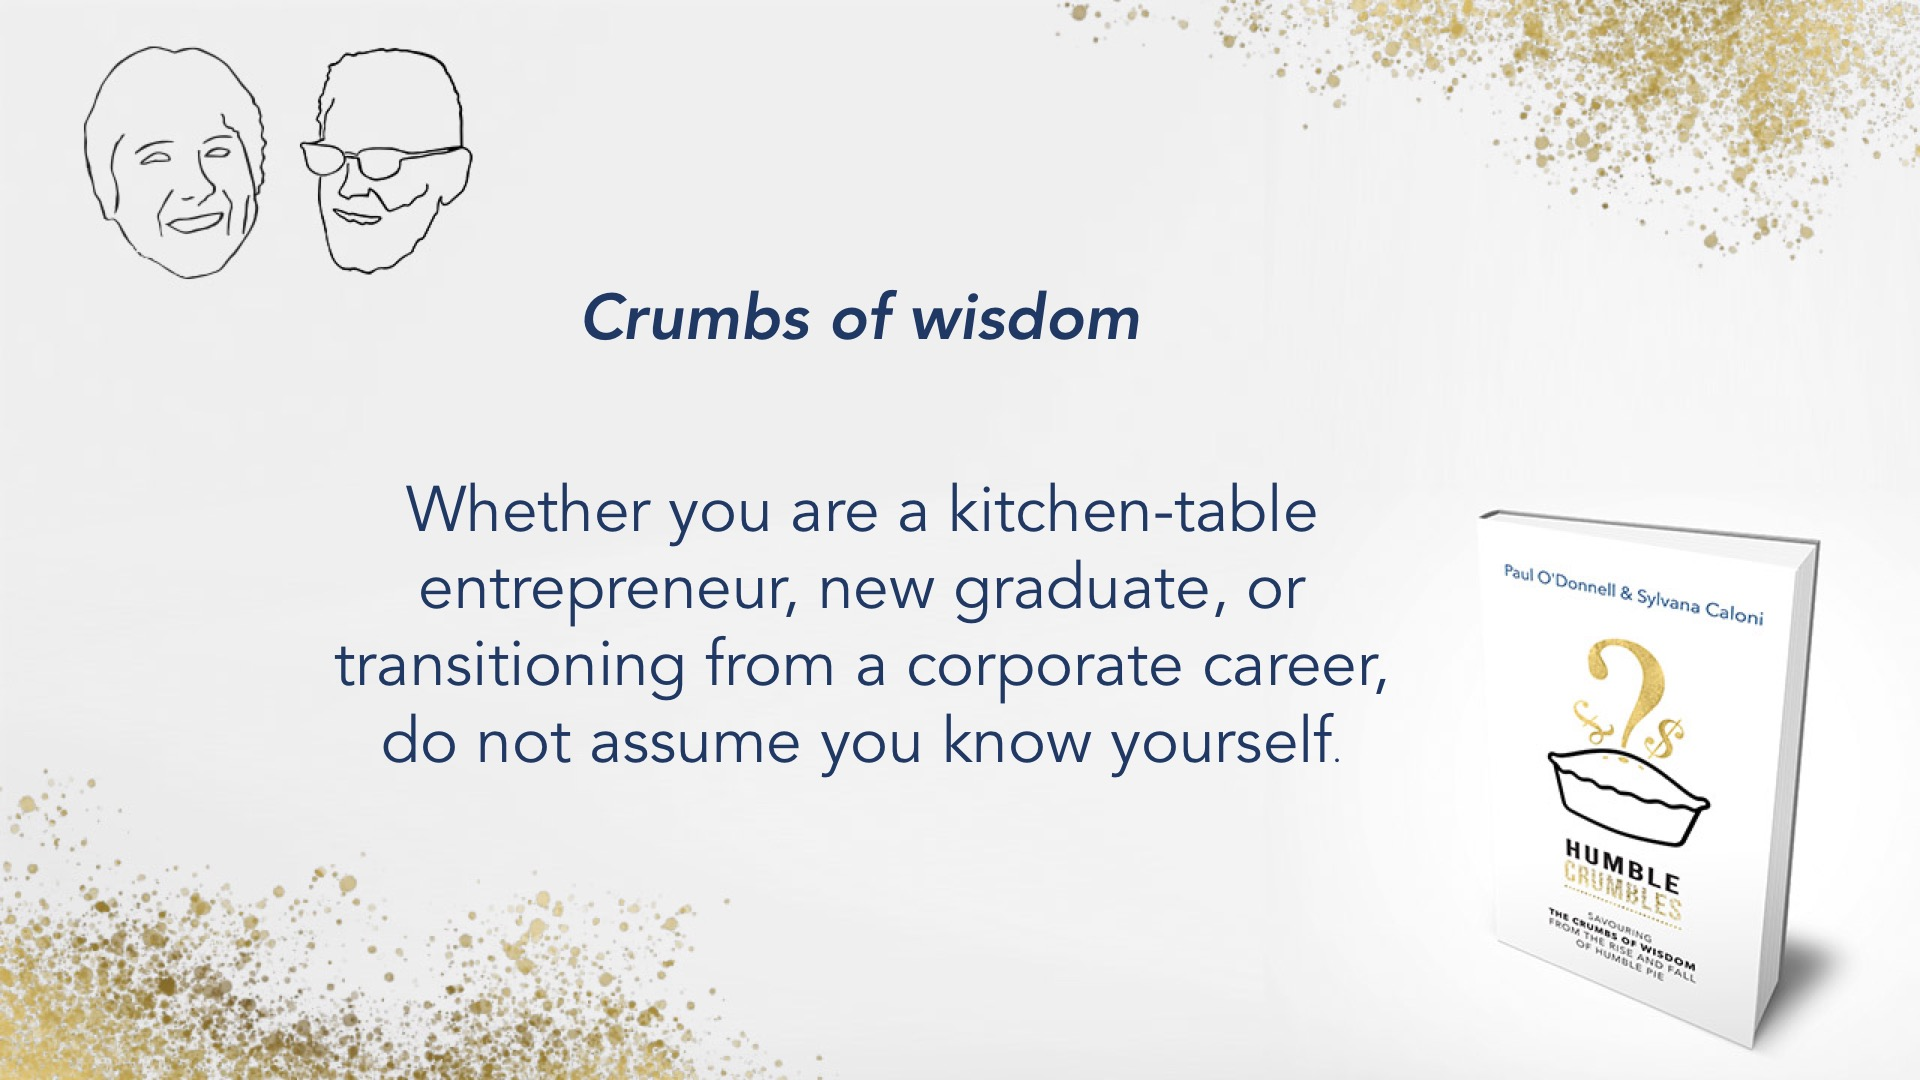 Crumbs of wisdom: self-awareness is key